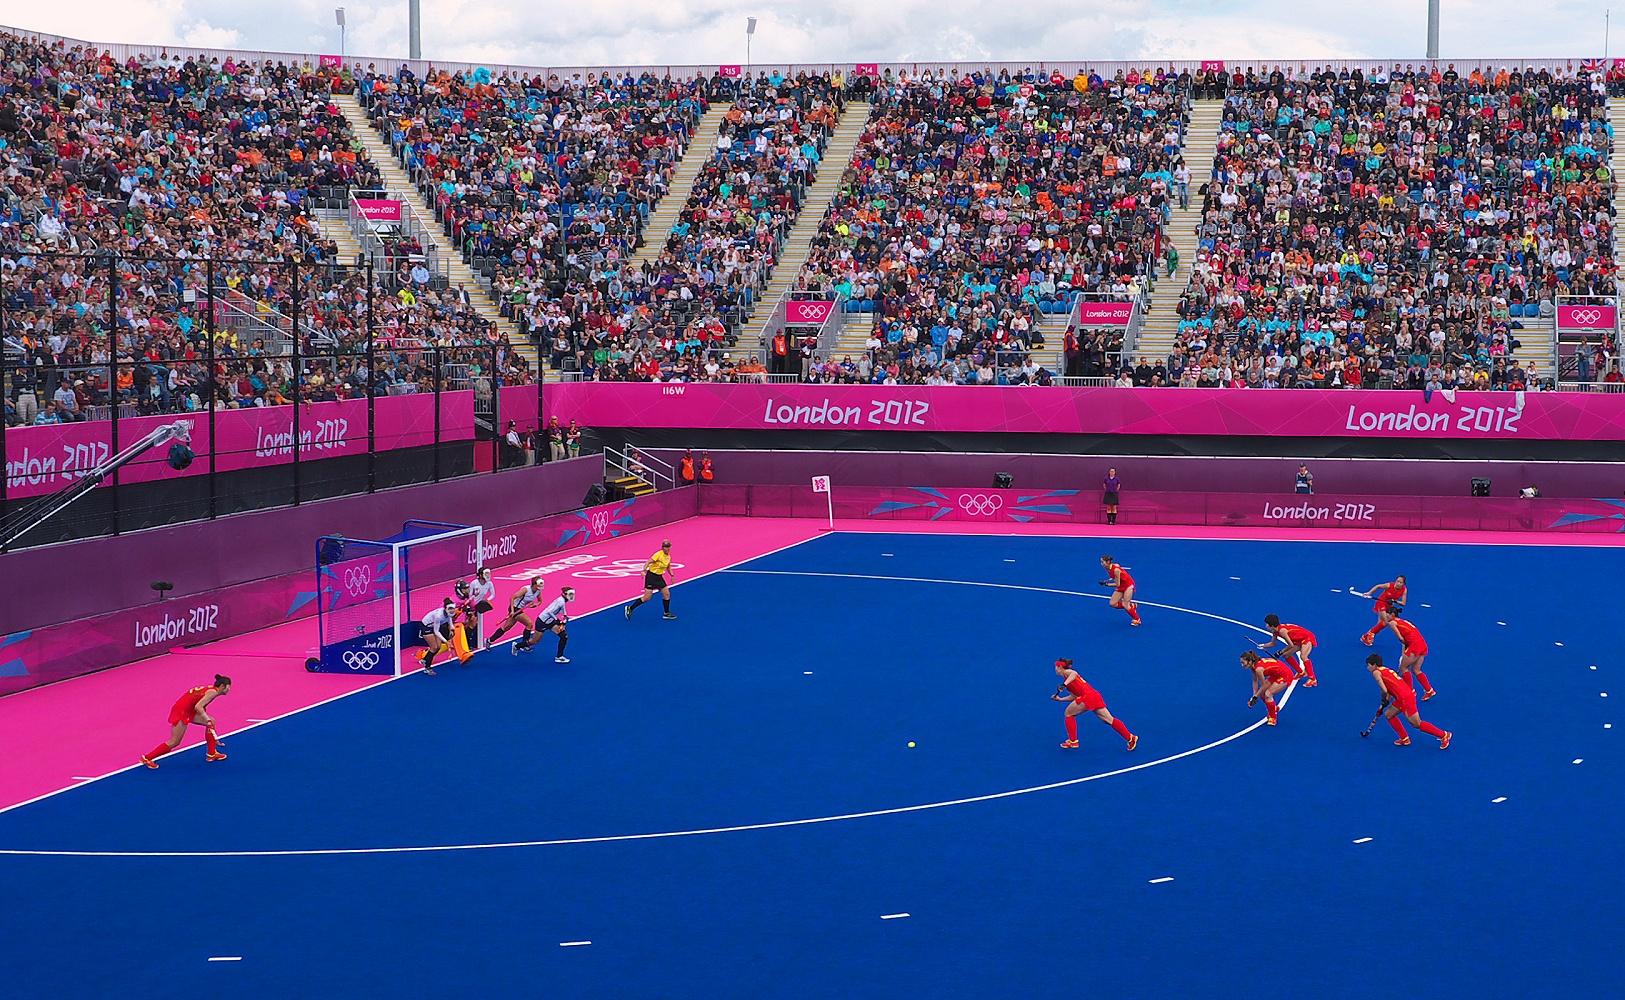 Riverbank Arena London 2012